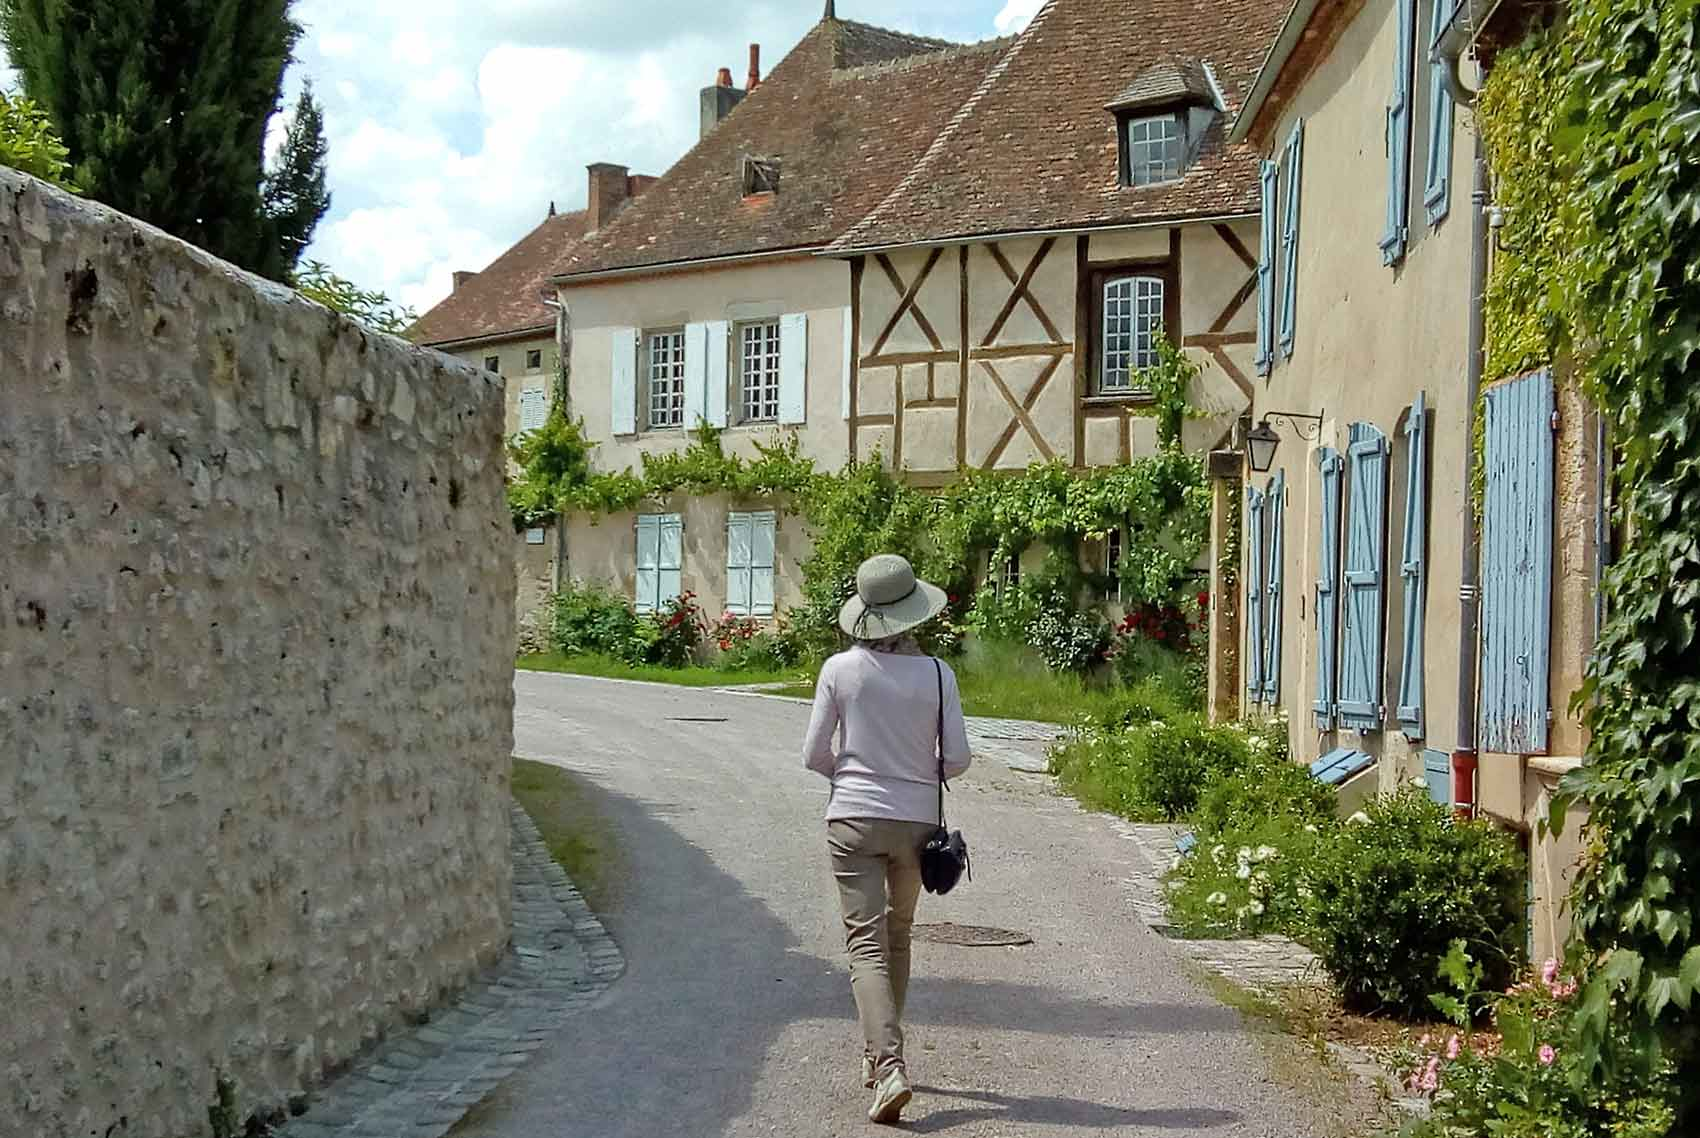 Omgeving Verneuil en Bourbonnais